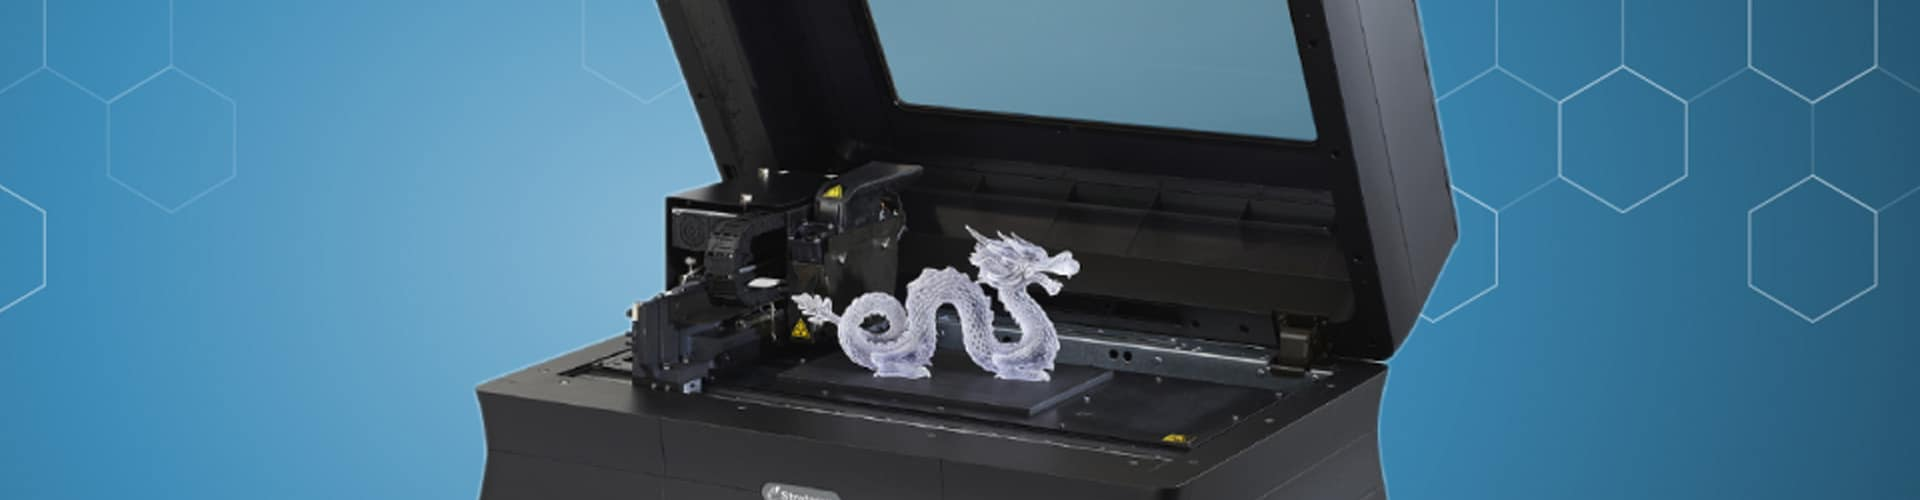 Objet30 Pro 3D Printer Review